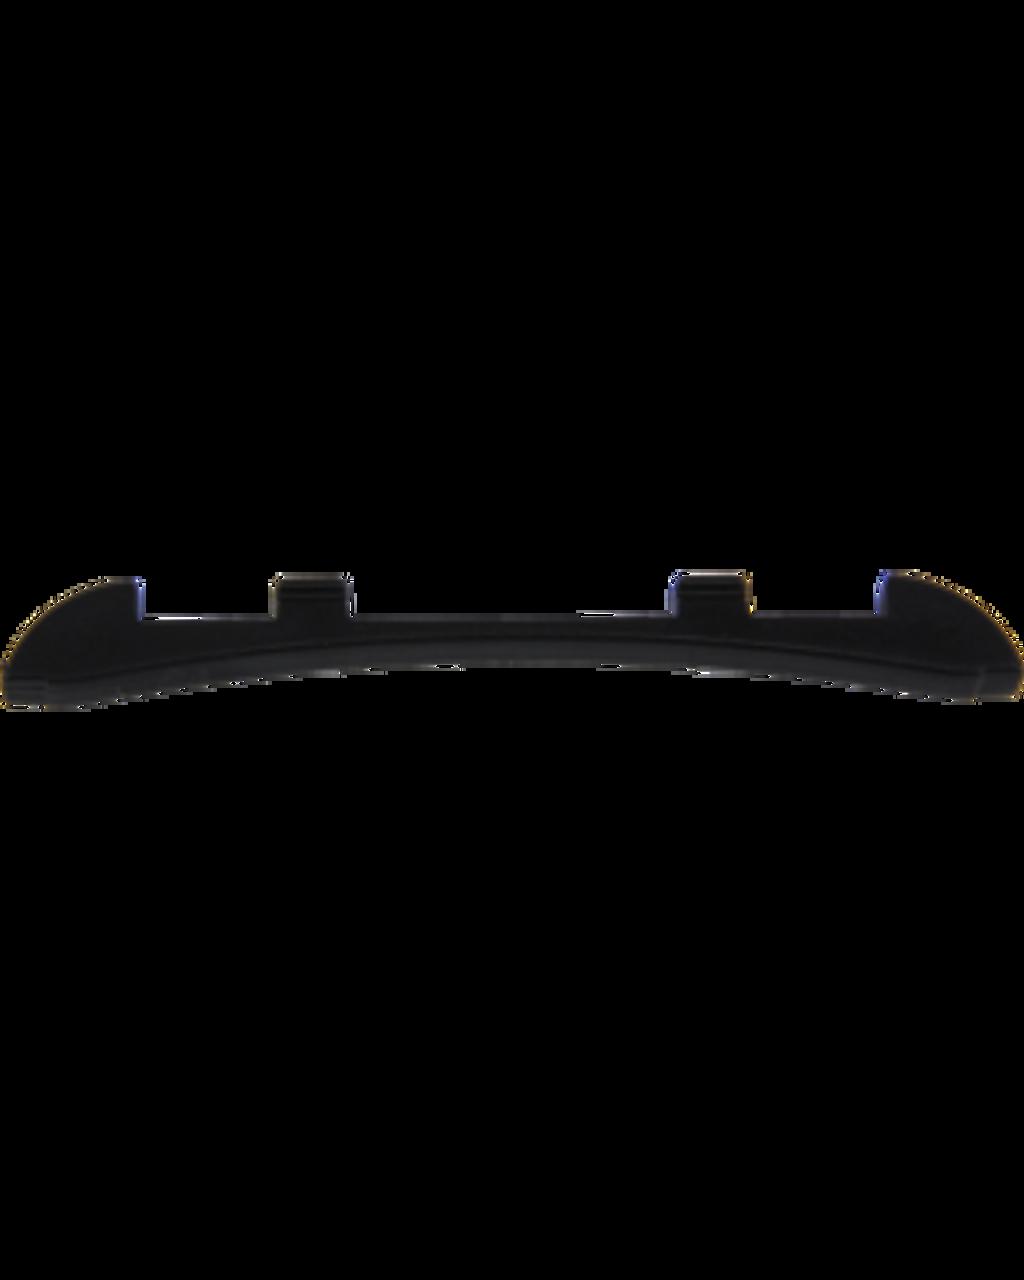 Blade-Tech Sting Ray DMP Shim Pair